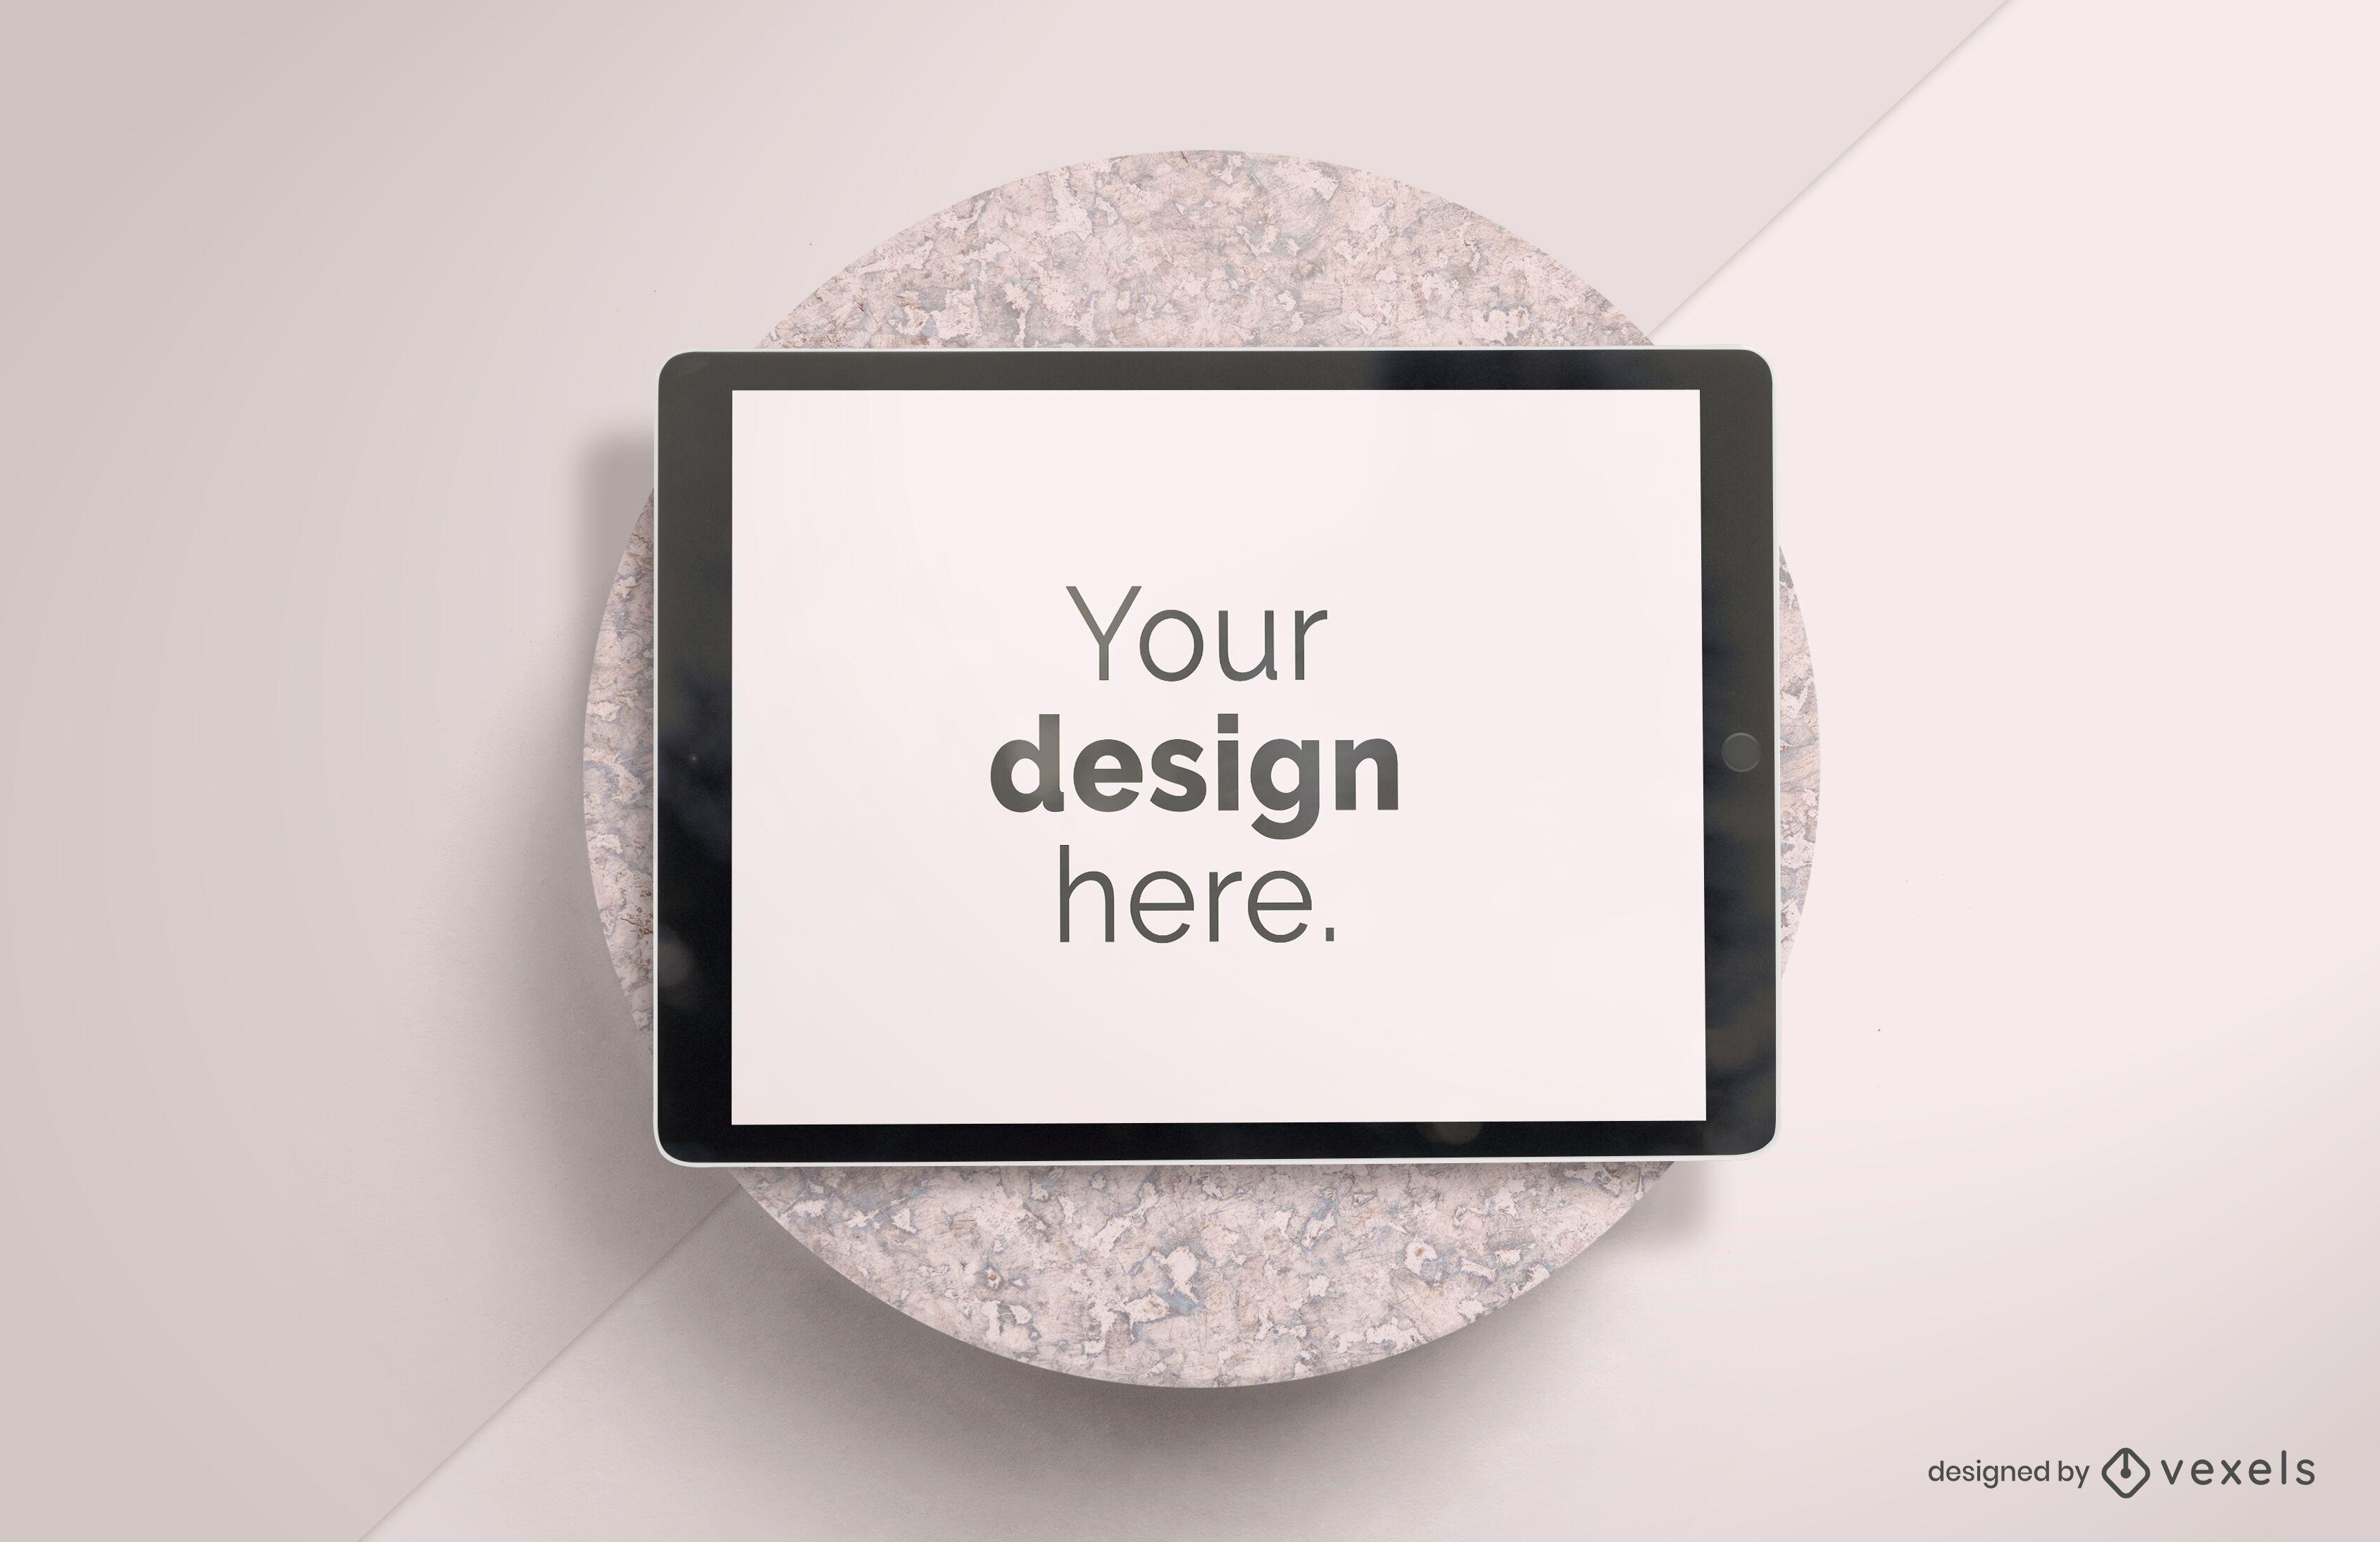 Ipad stone mockup design